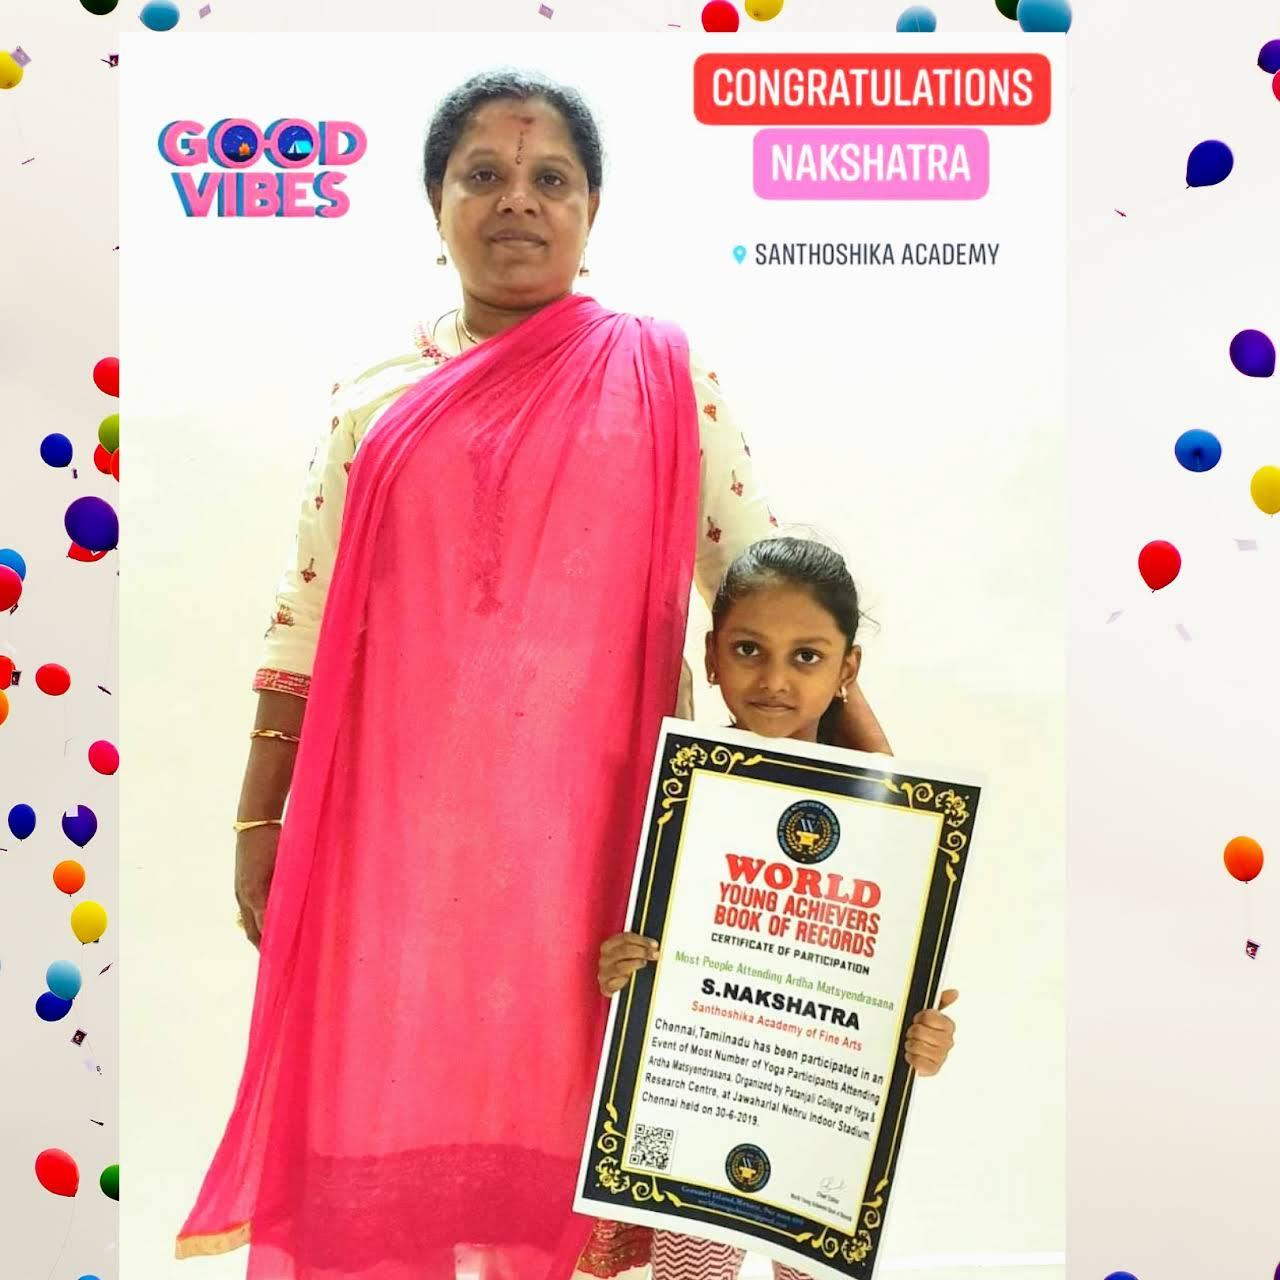 Santhoshika Academy of Fine Arts - Dance School in Chennai